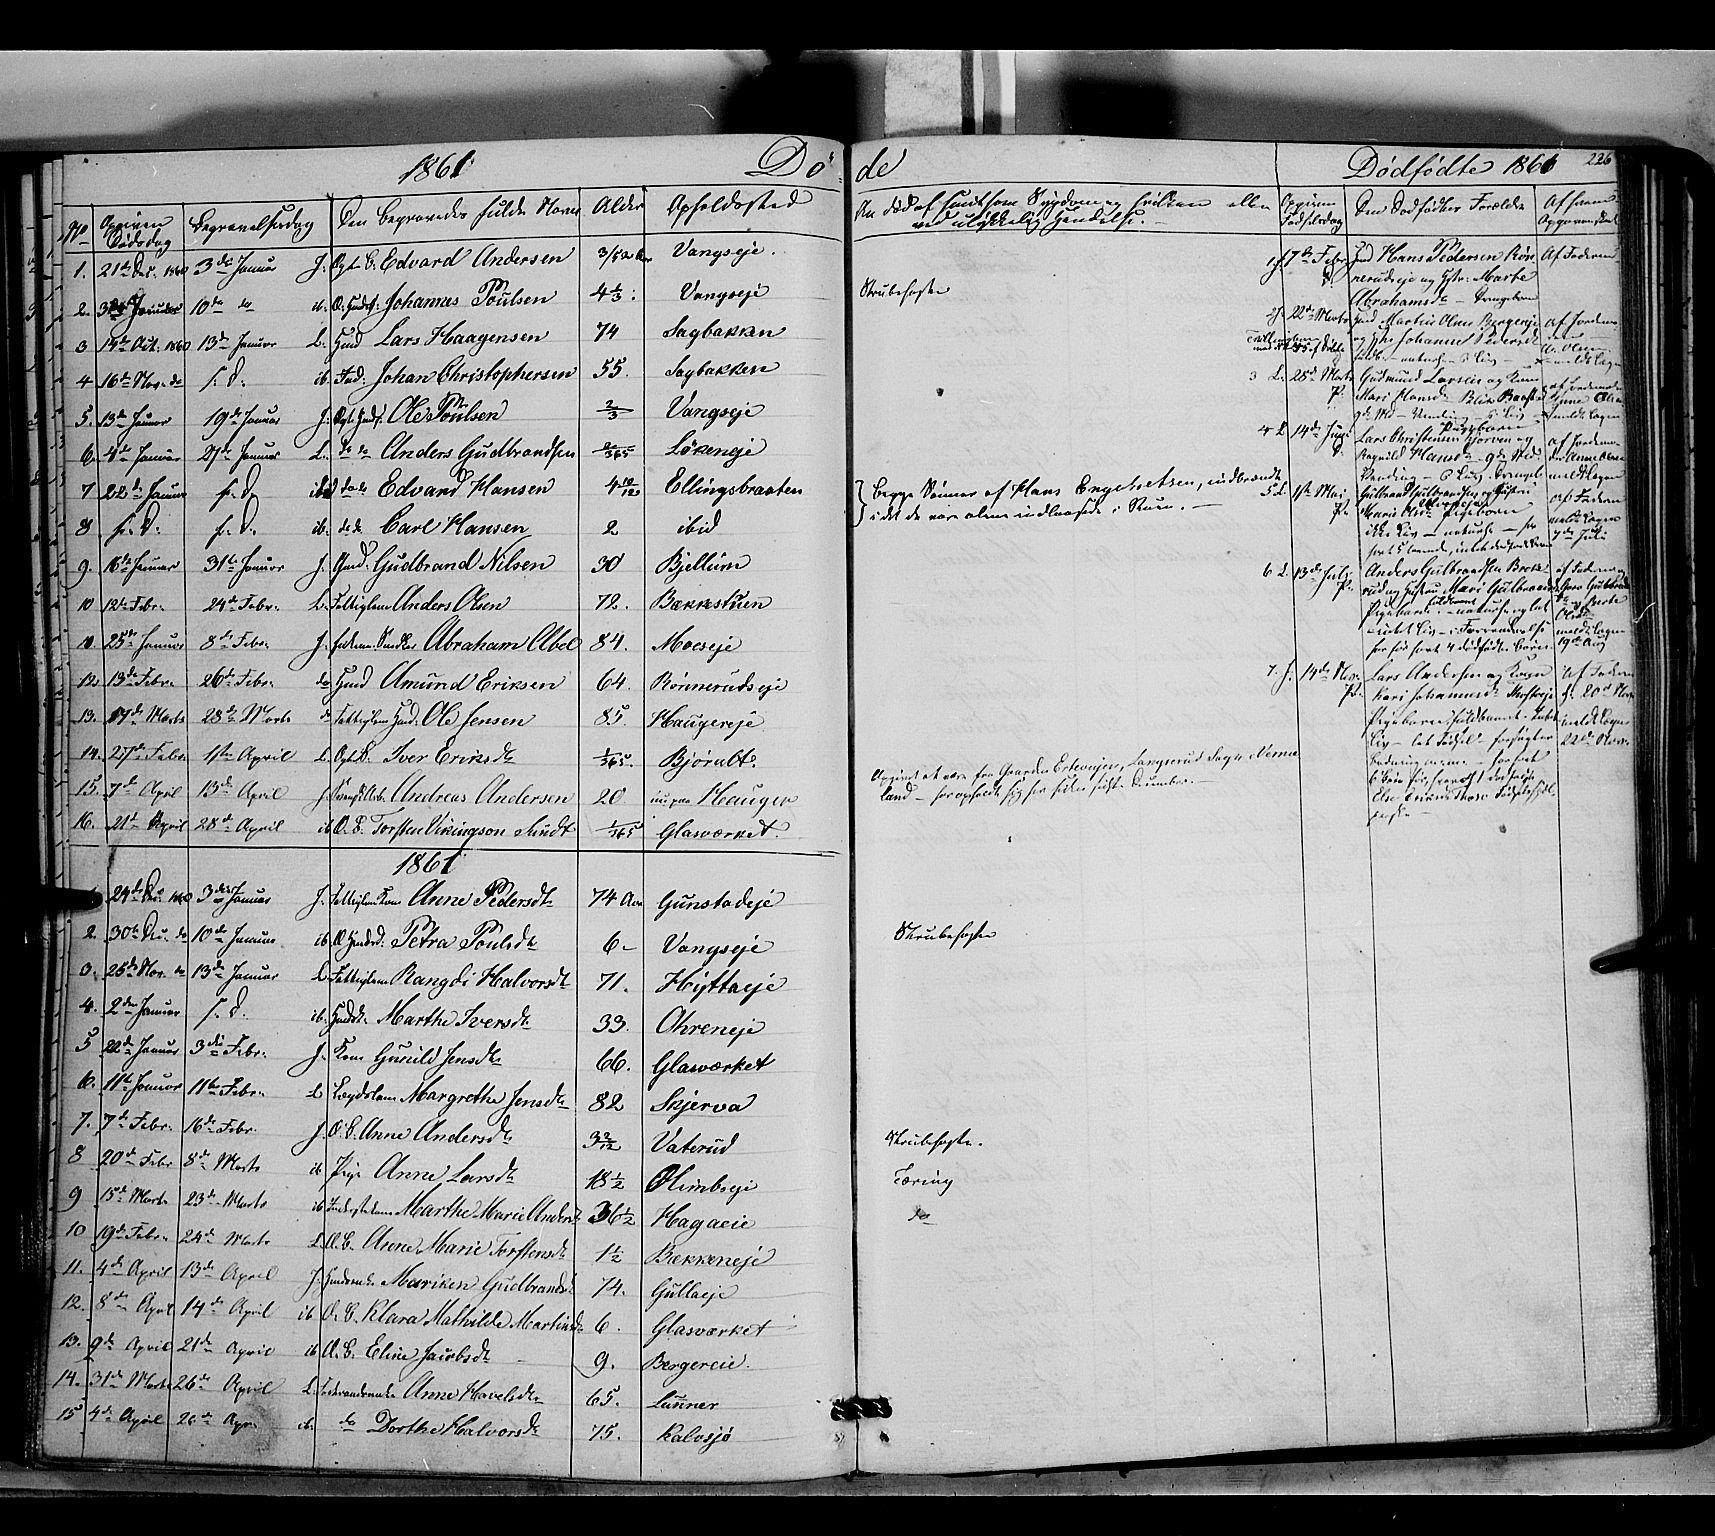 SAH, Jevnaker prestekontor, Ministerialbok nr. 7, 1858-1876, s. 226